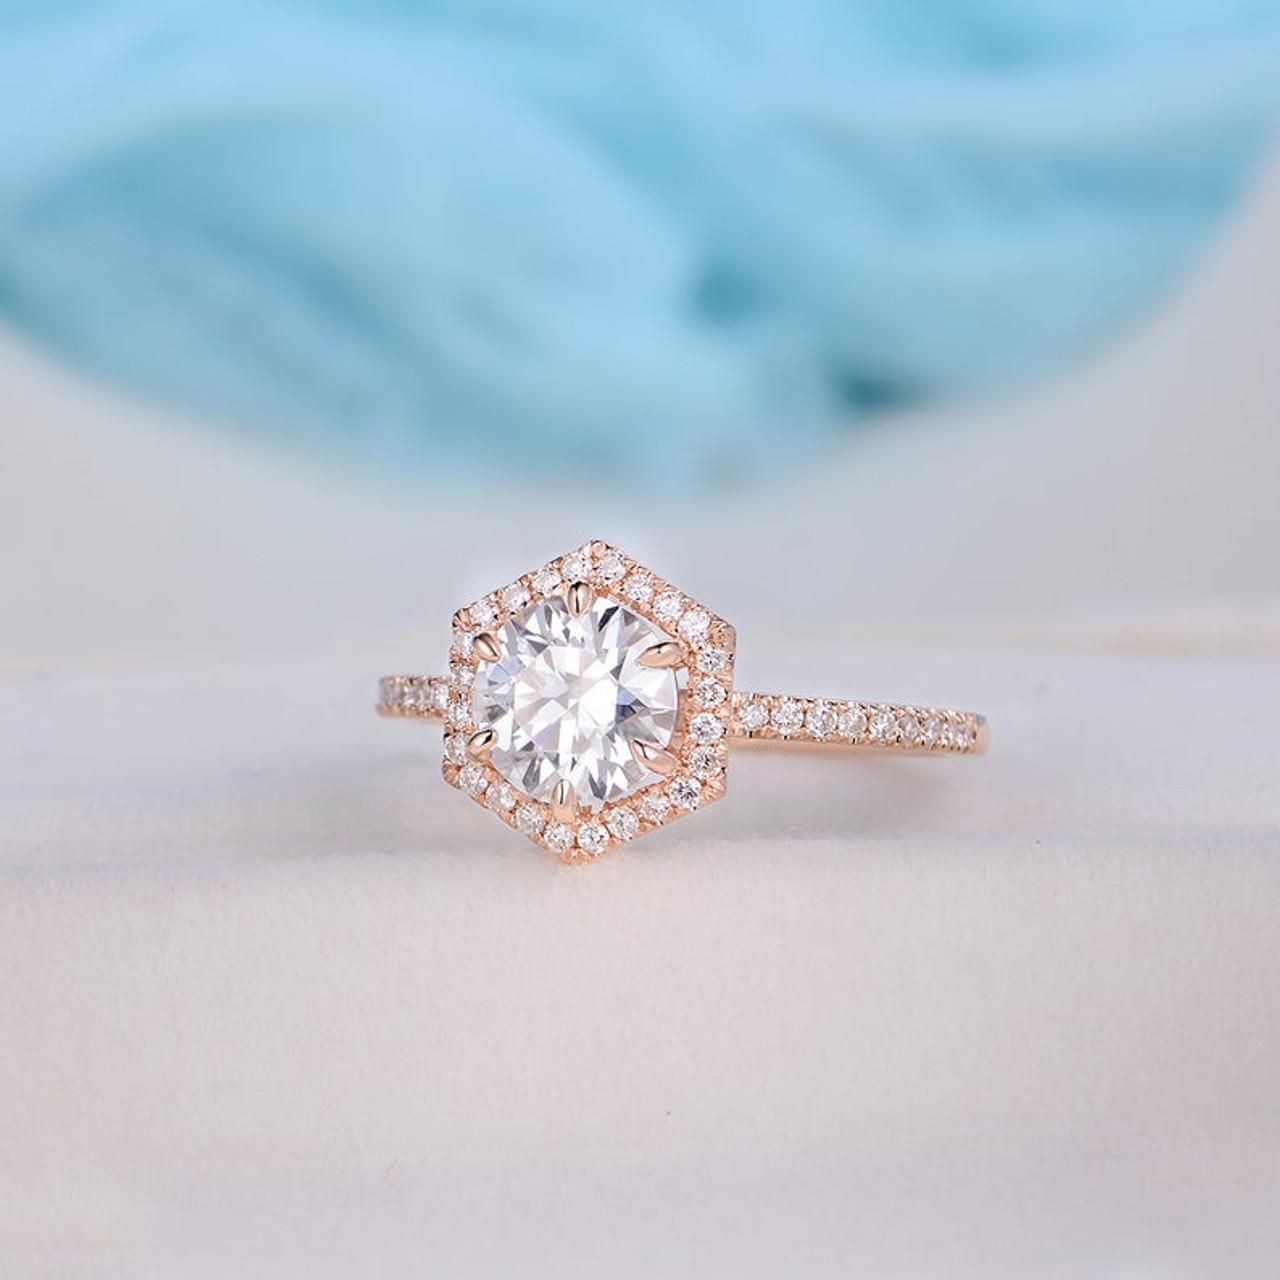 7mm Round Moissanite Diamond Ellow Gold Engagement Ring